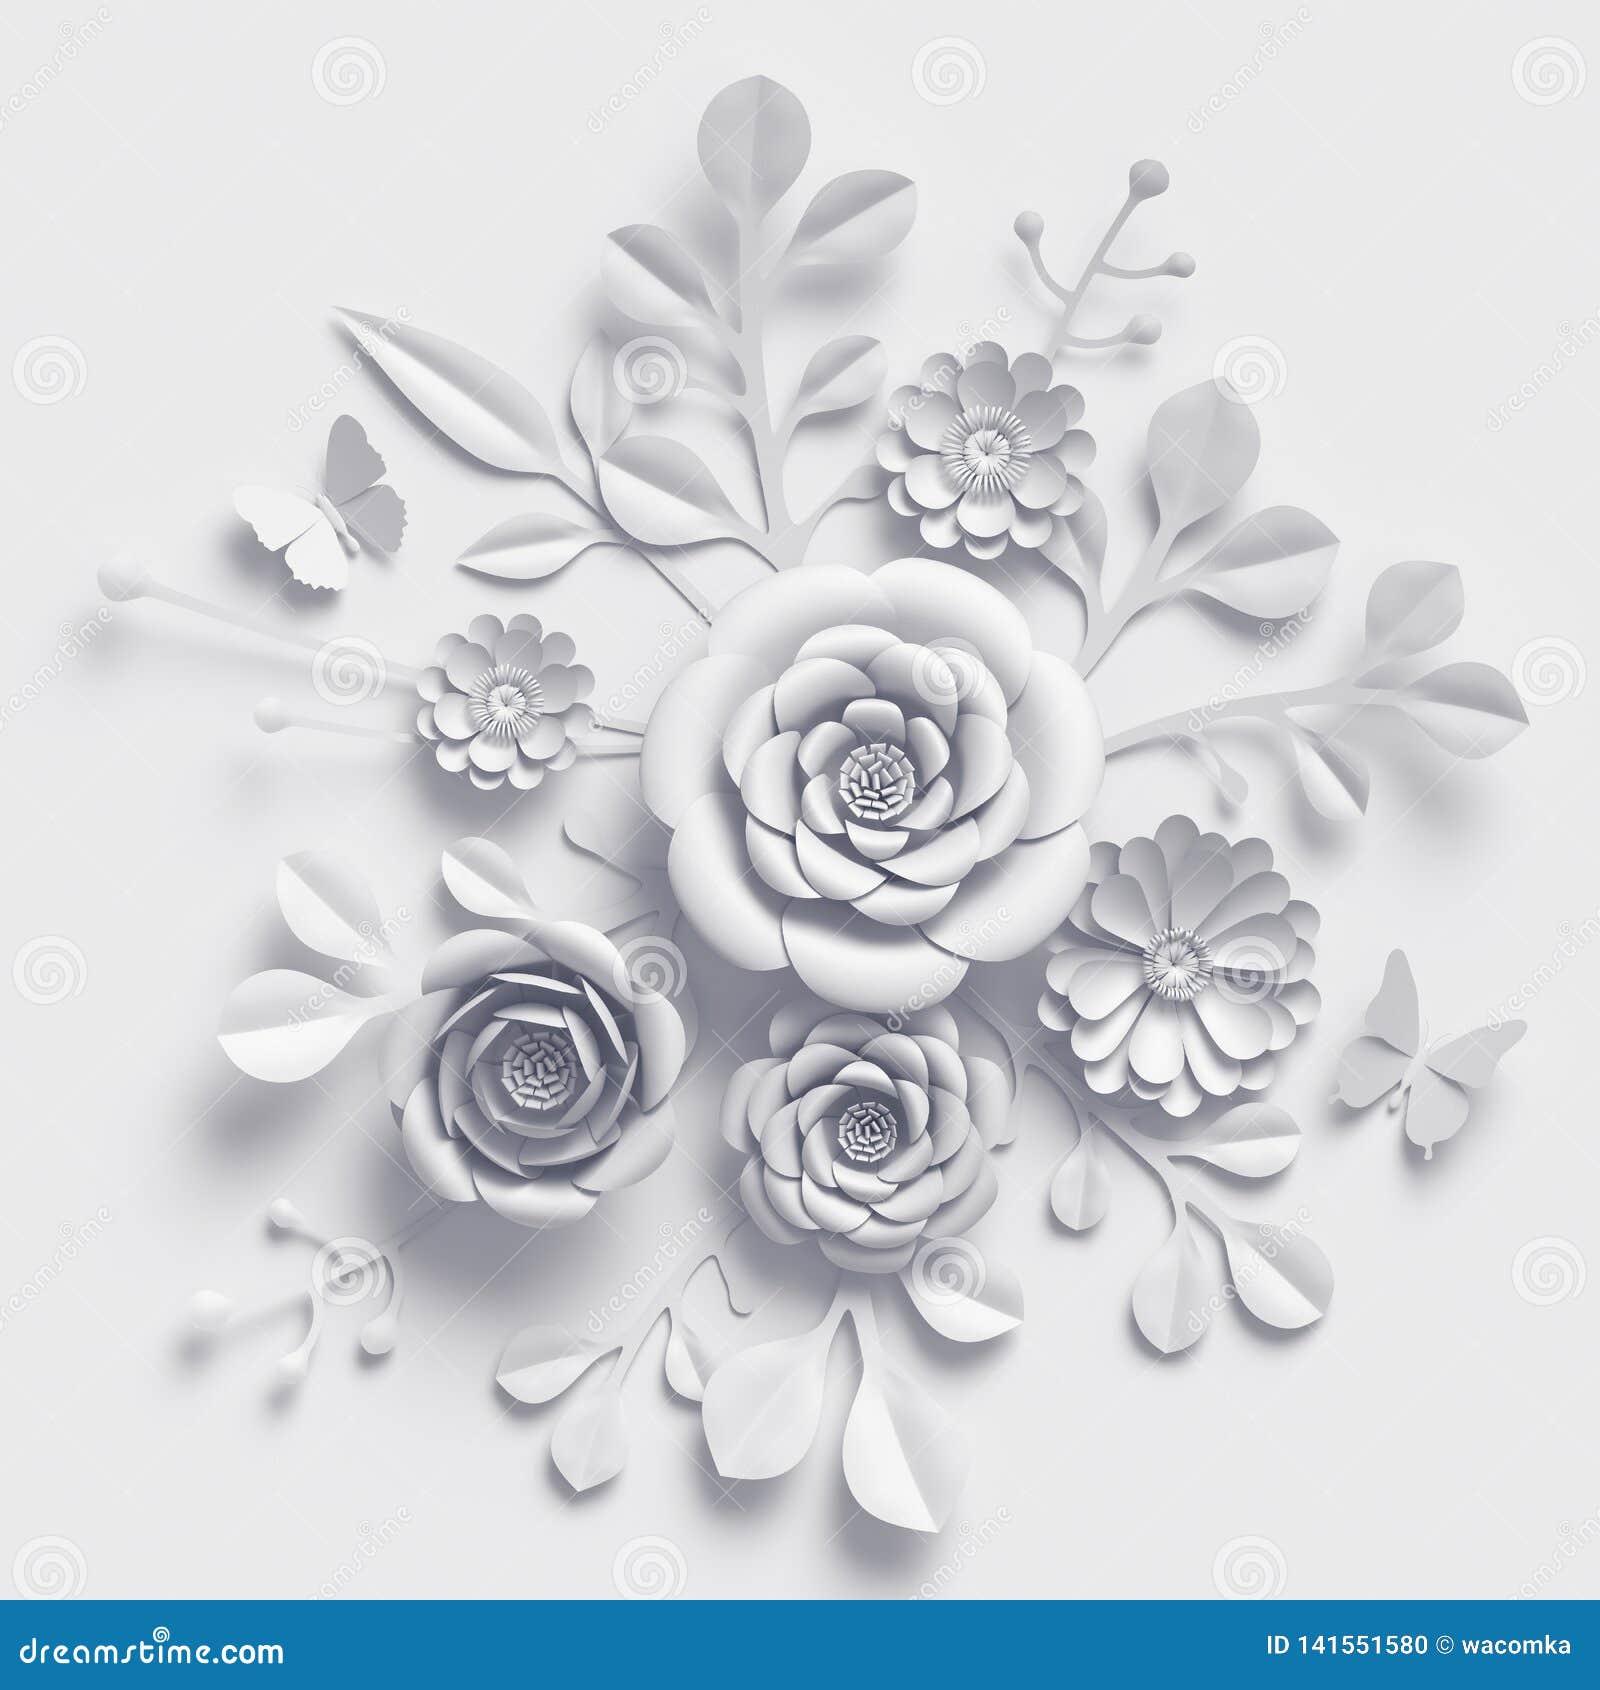 3d render, white wedding paper flowers, floral bouquet, botanical background, paper craft